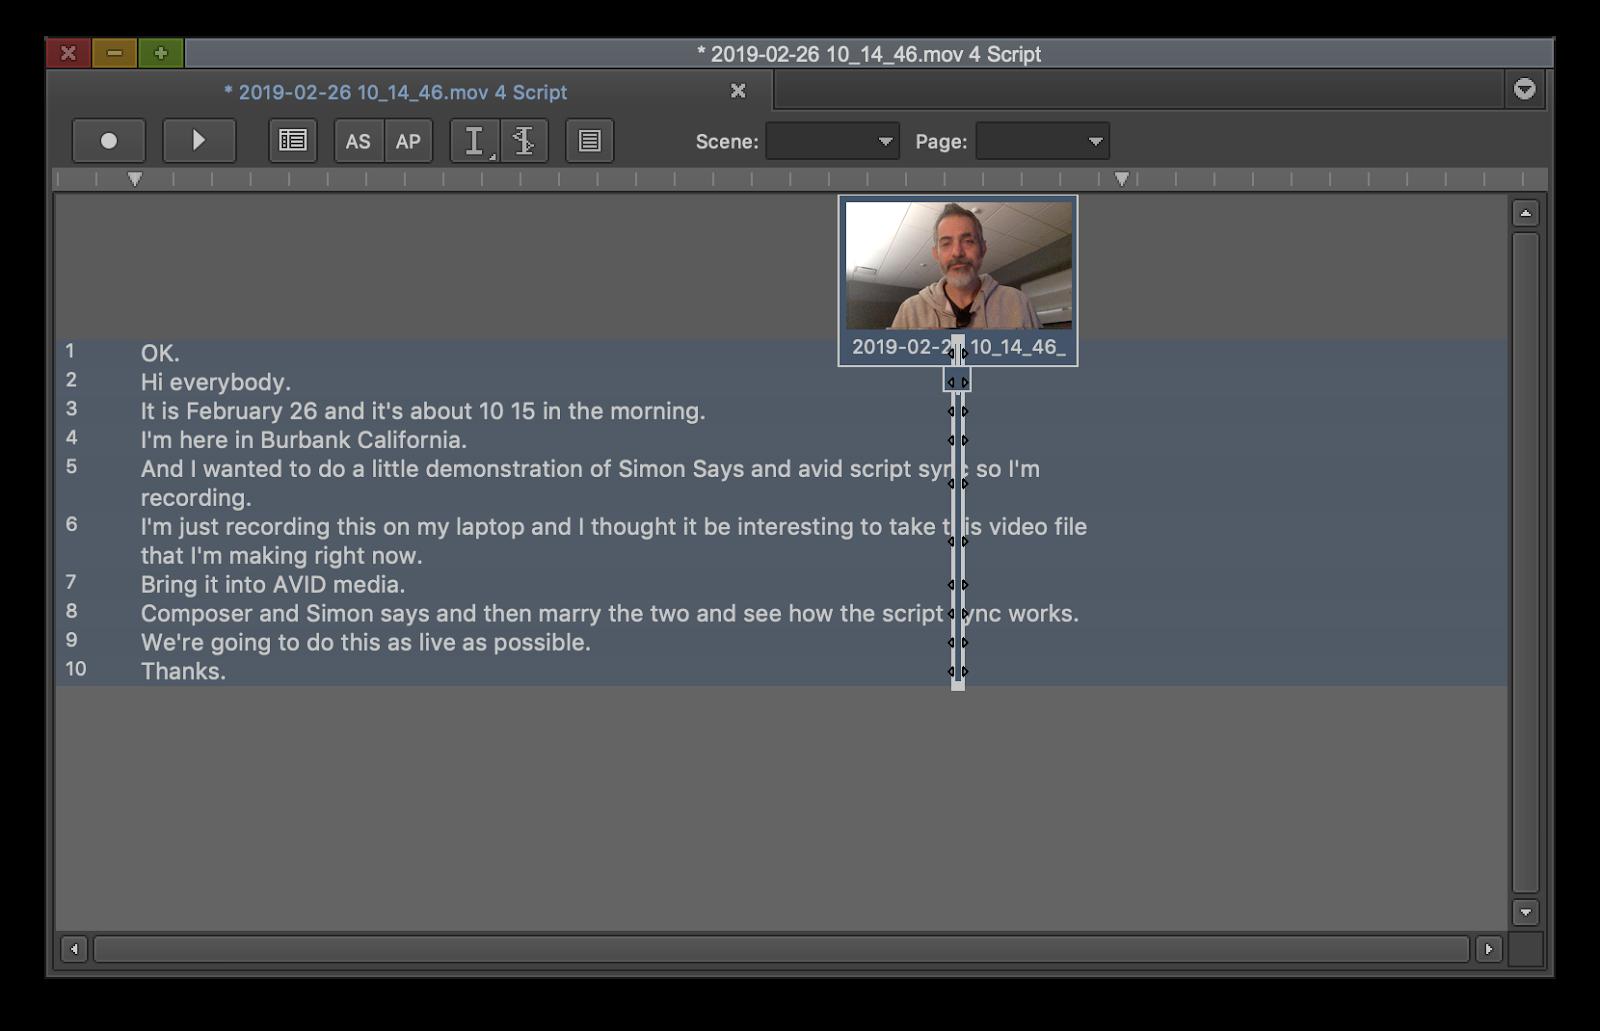 Avid creates sync marks for each line of text